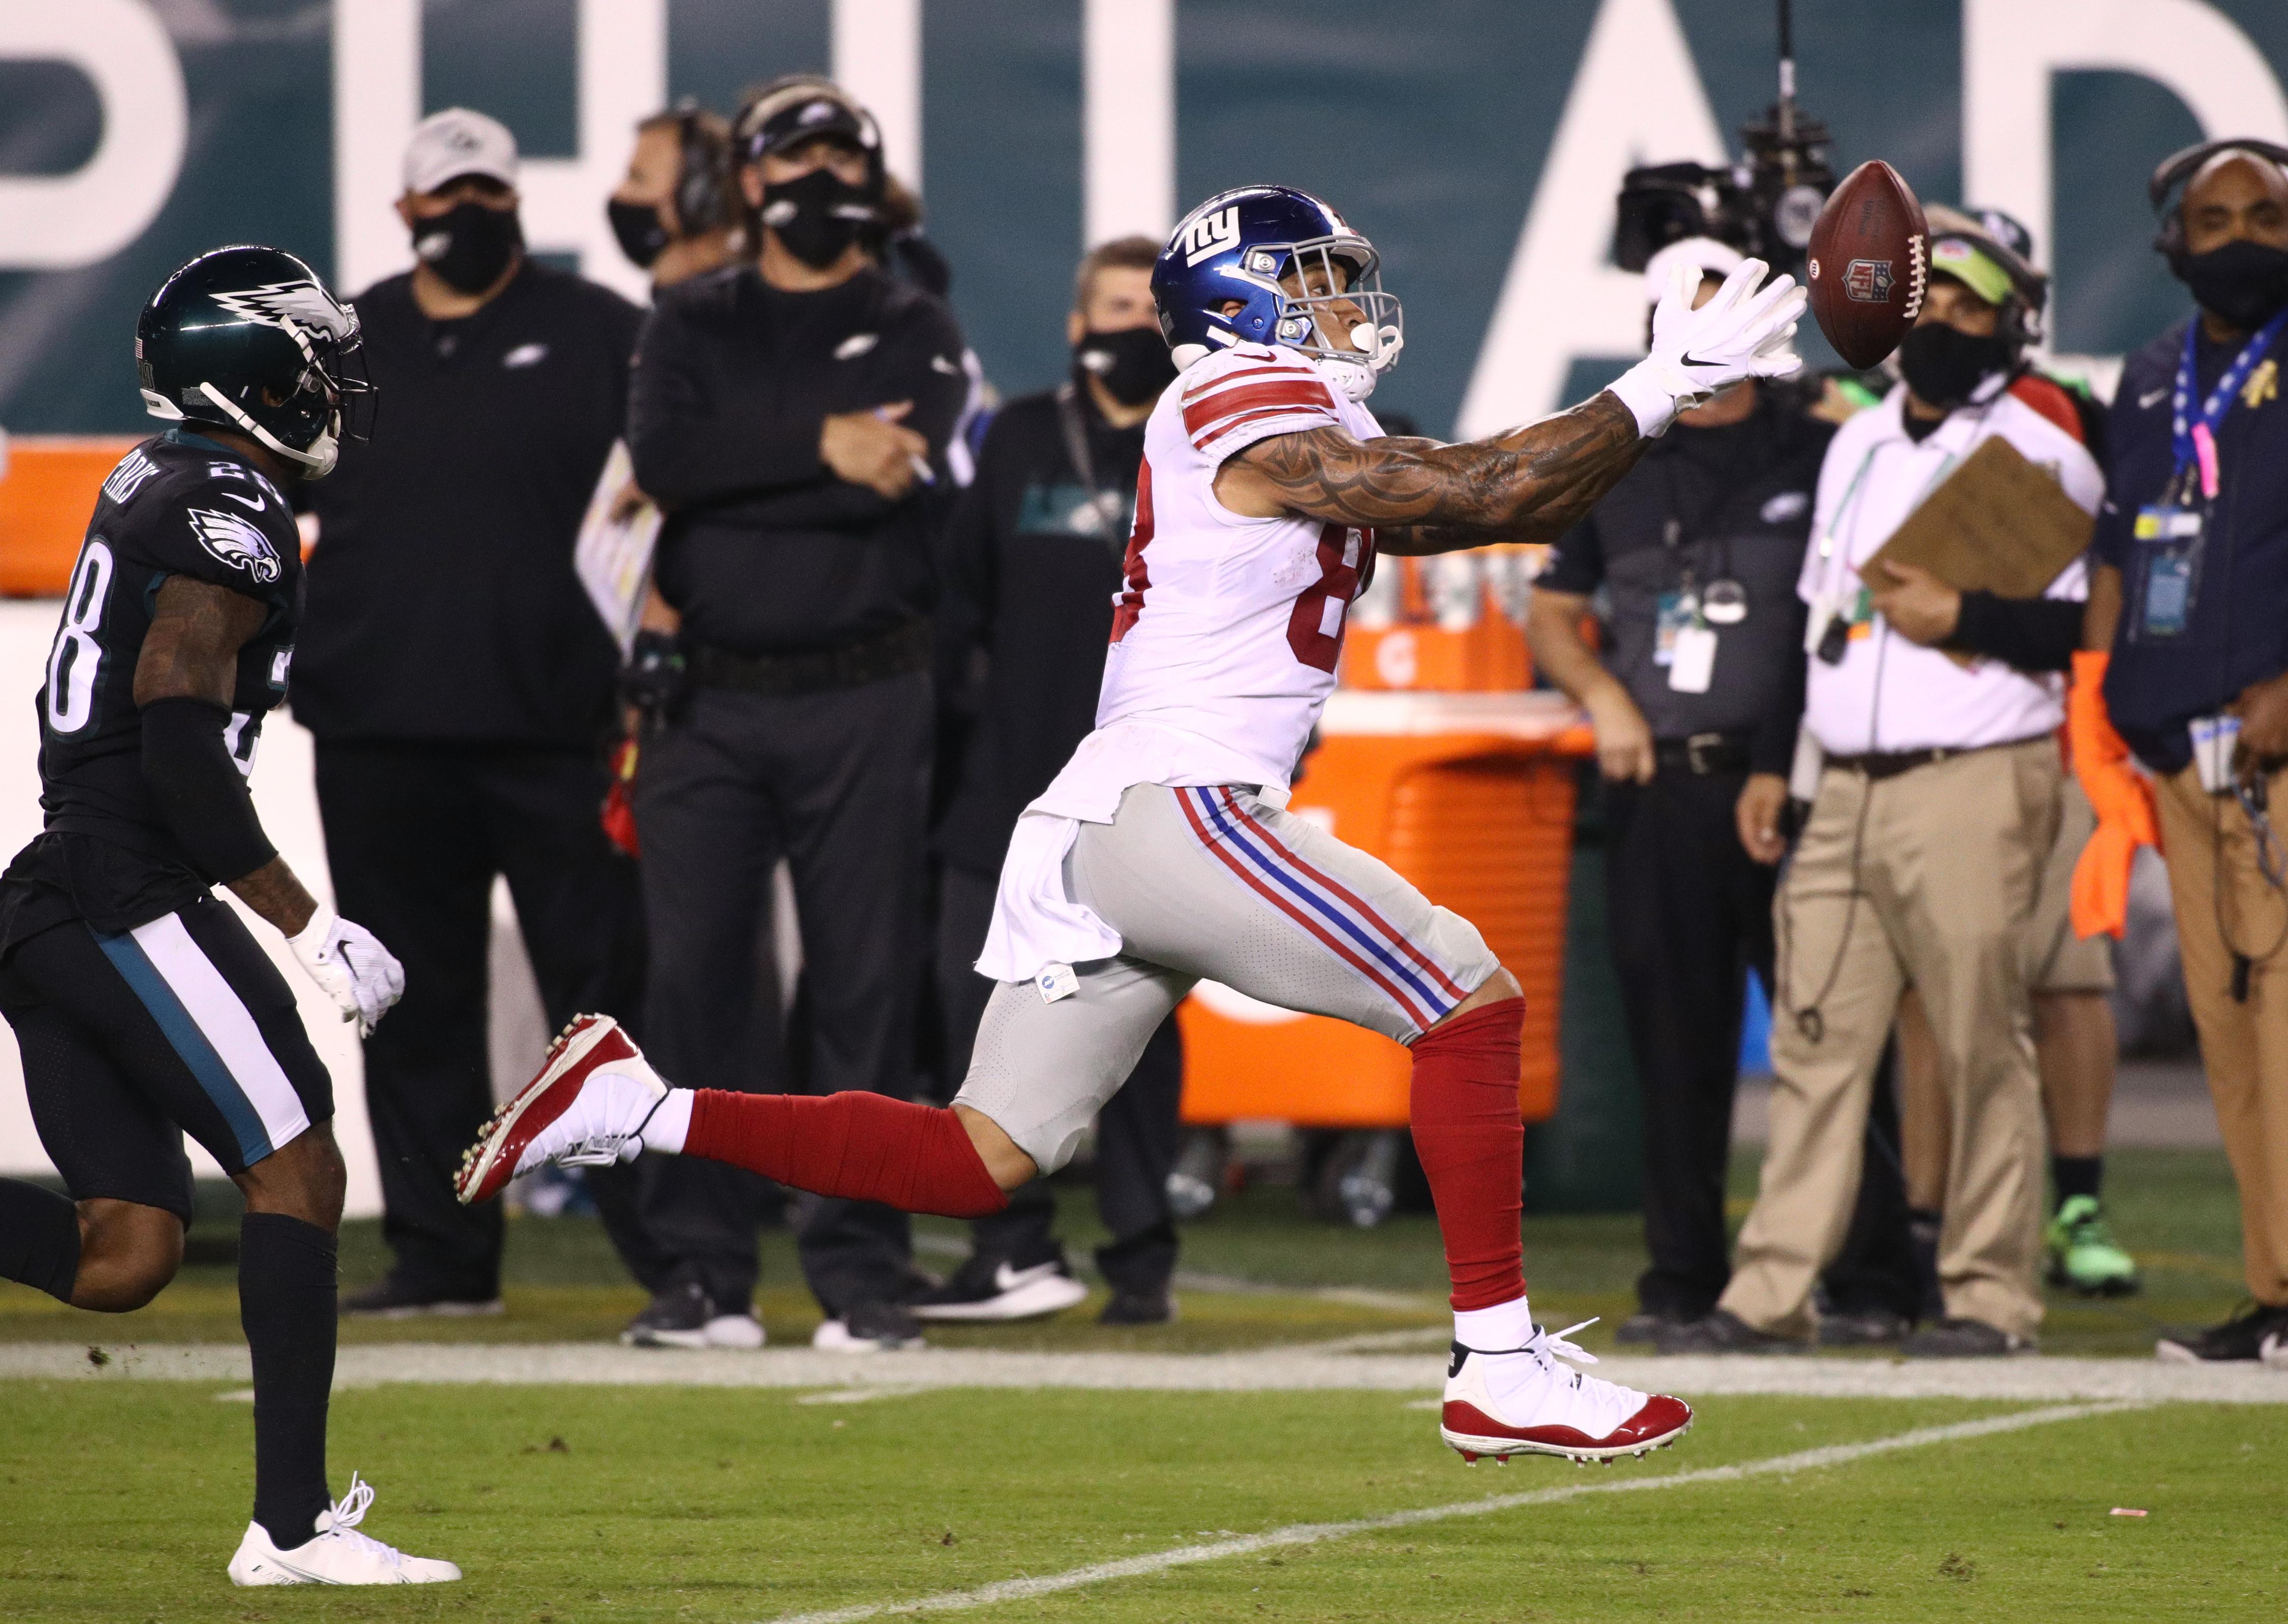 NFL: OCT 22 Giants at Eagles